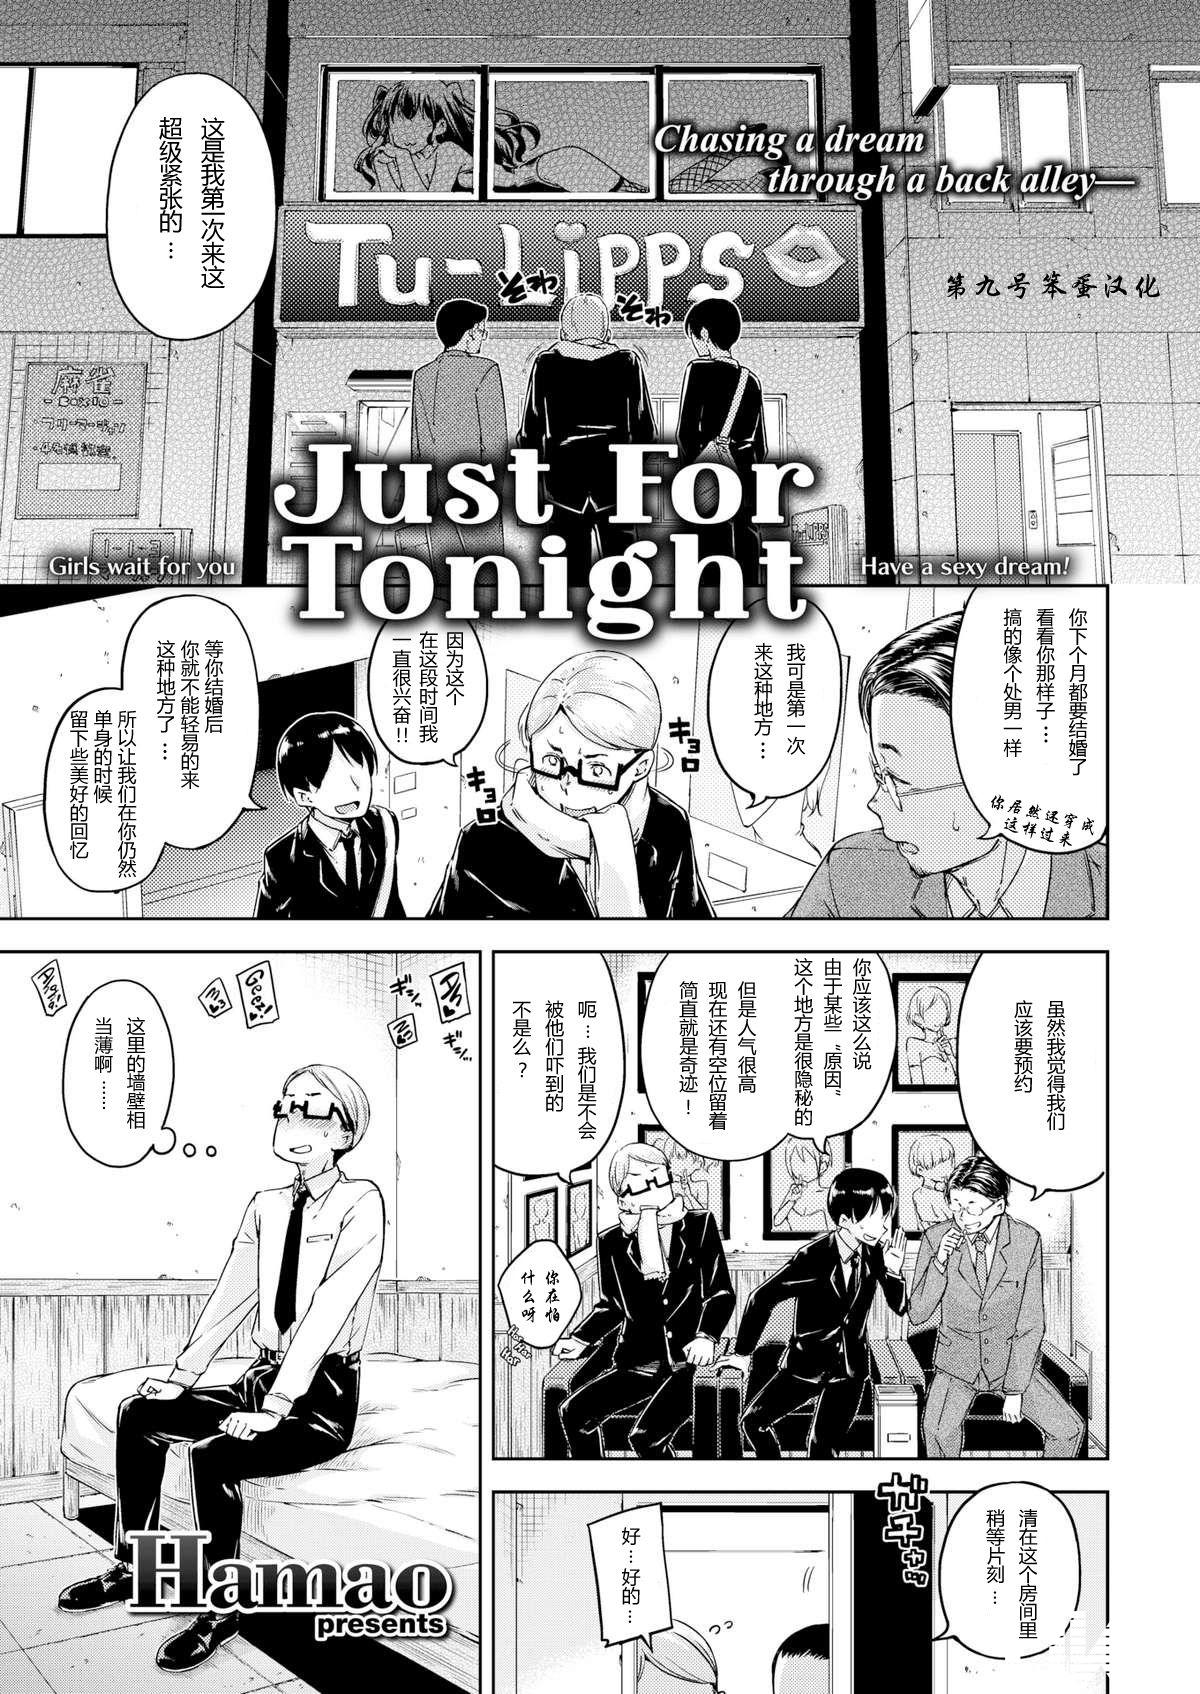 [Hamao] Just for Tonight - 情色卡漫 -